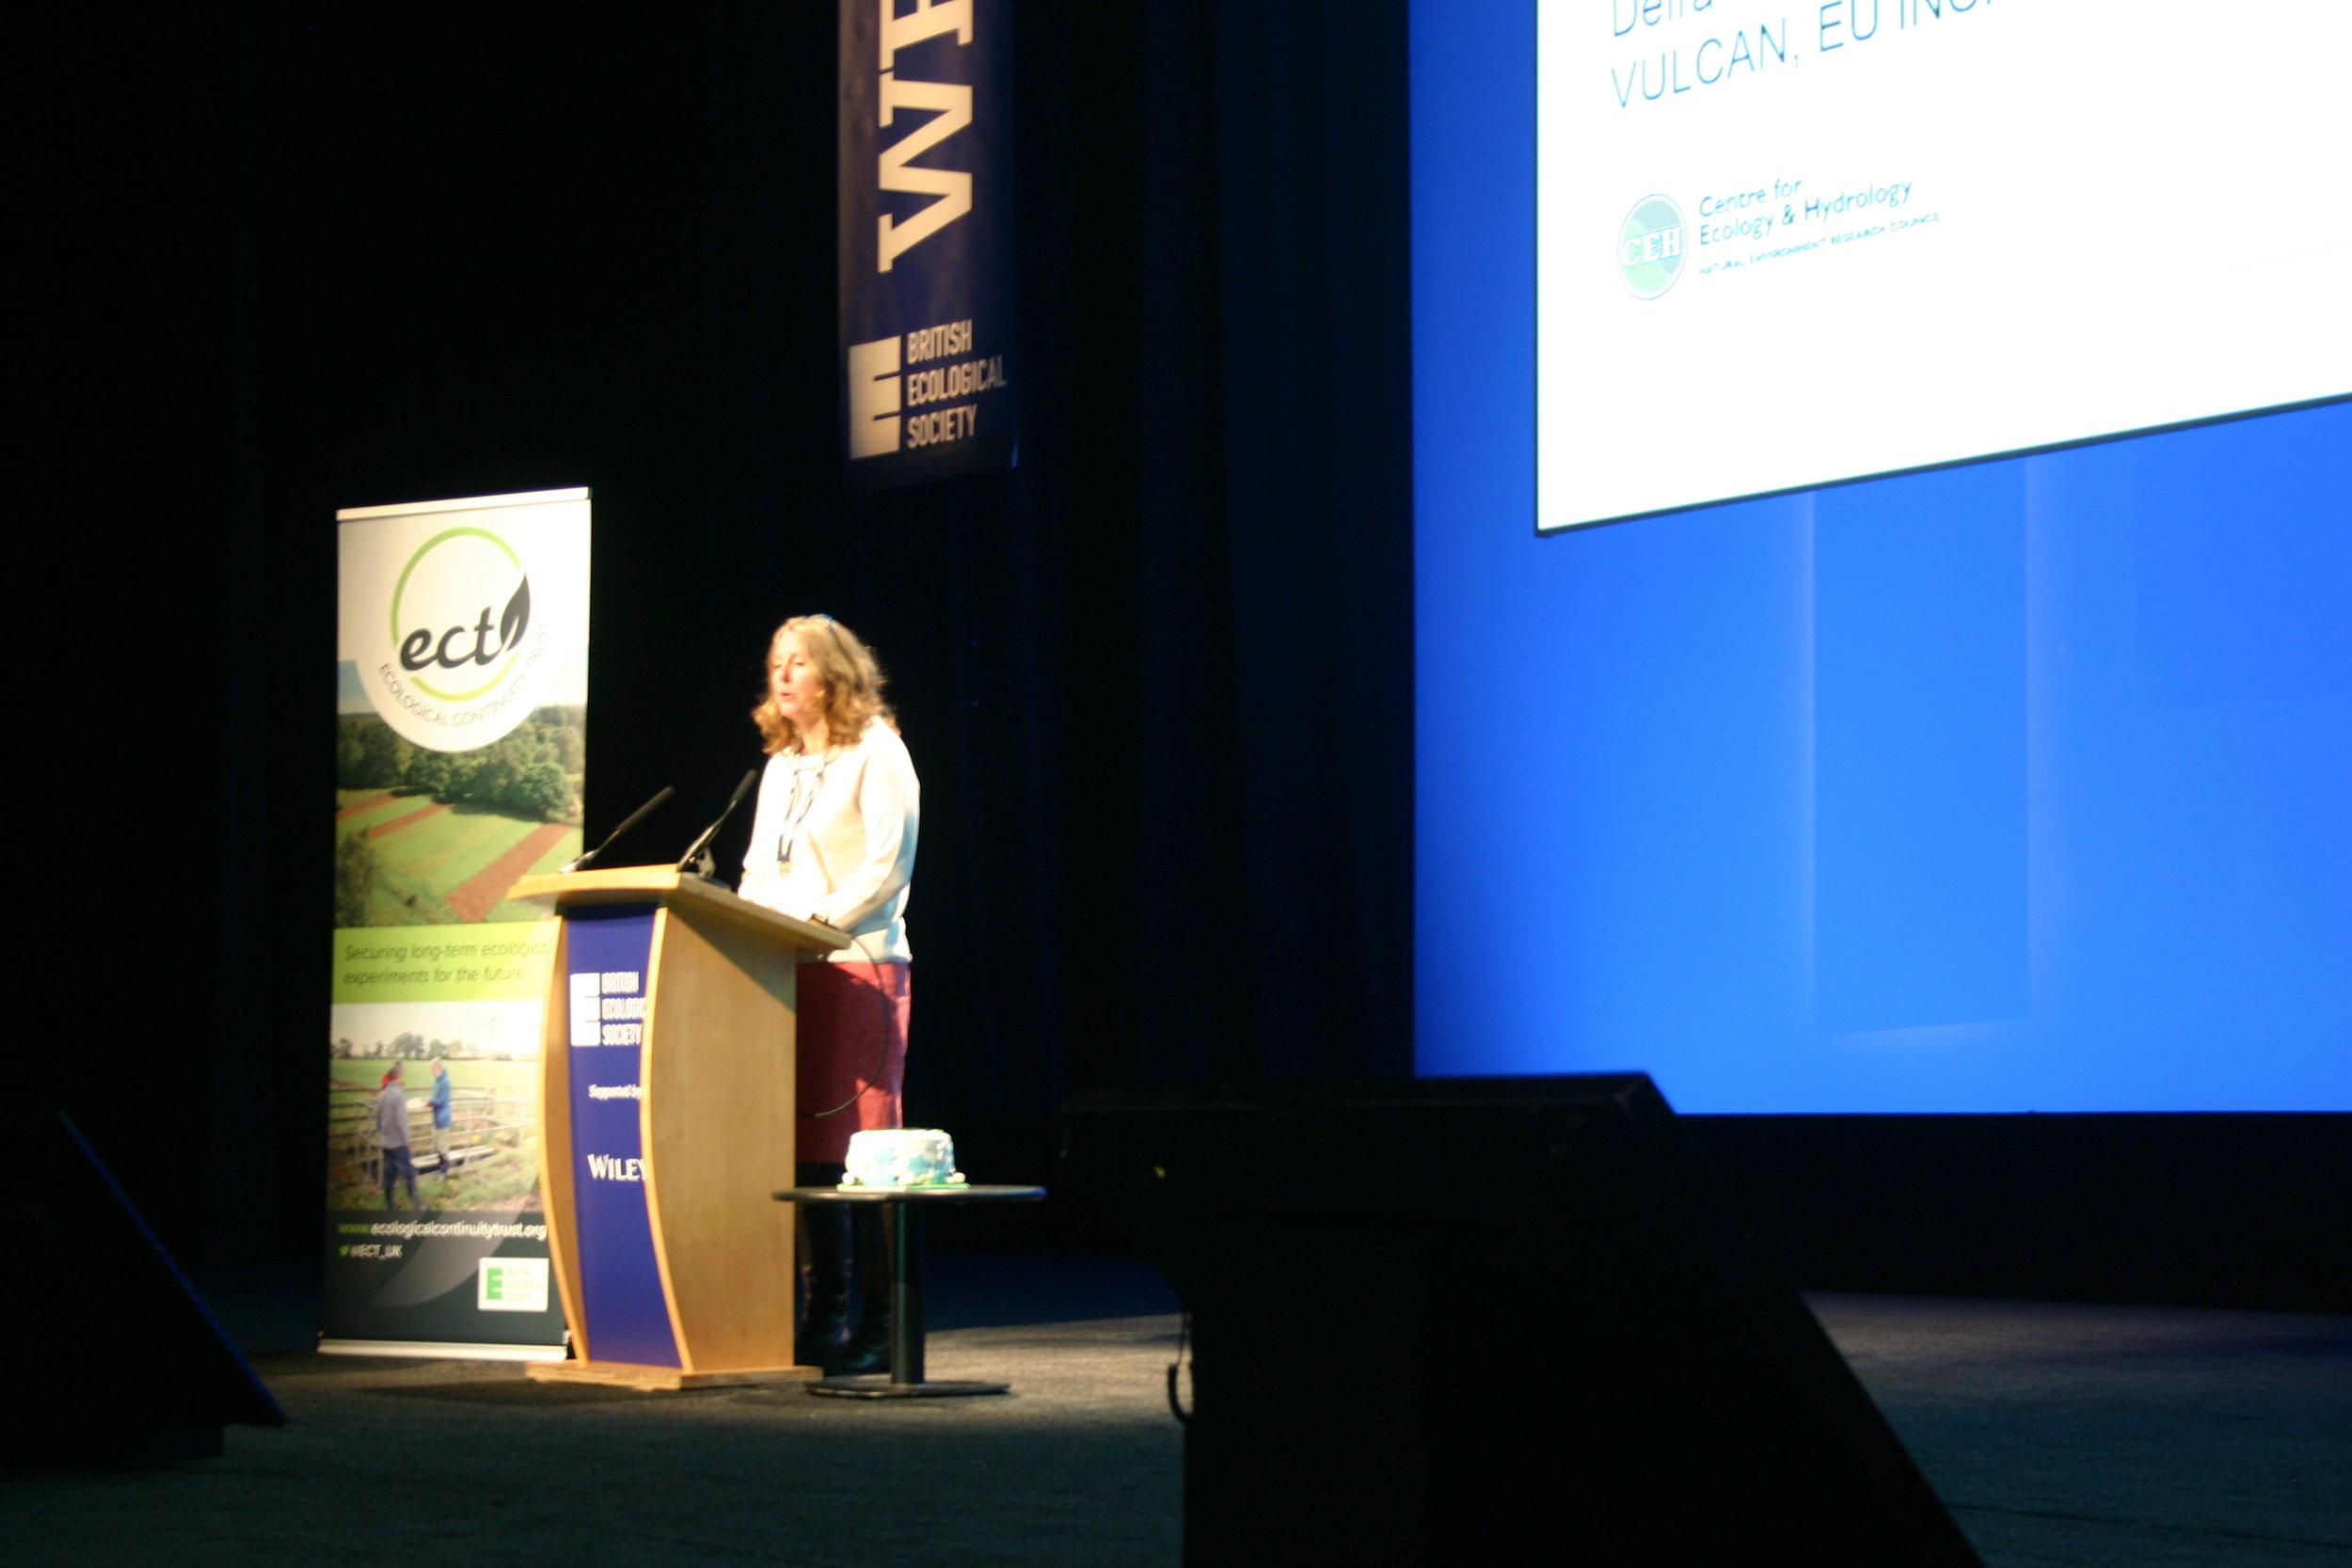 bes 2018 conference, Birmingham - keynote speaker prof bridget emmett